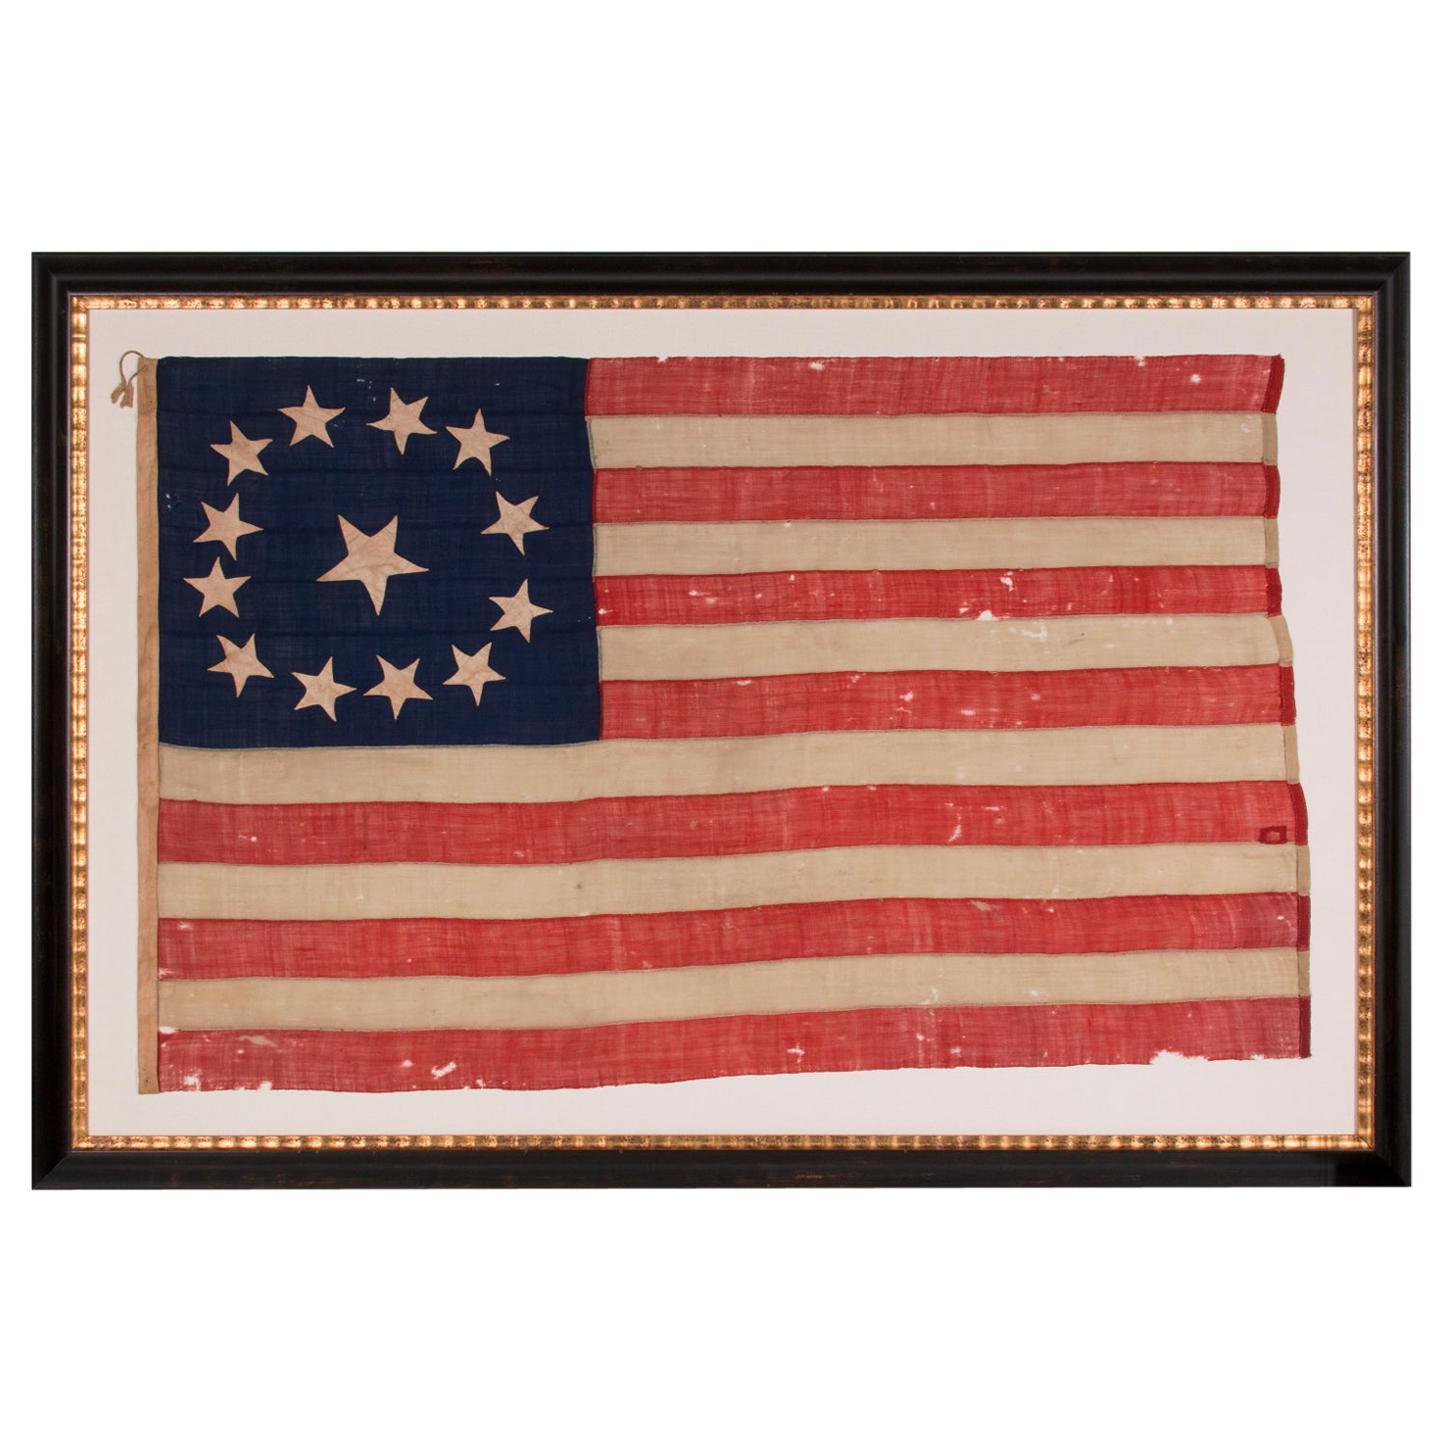 13 Star, 3rd MD Pattern, Hand-Sewn Antique American Flag, Civil War Era, 1861-65